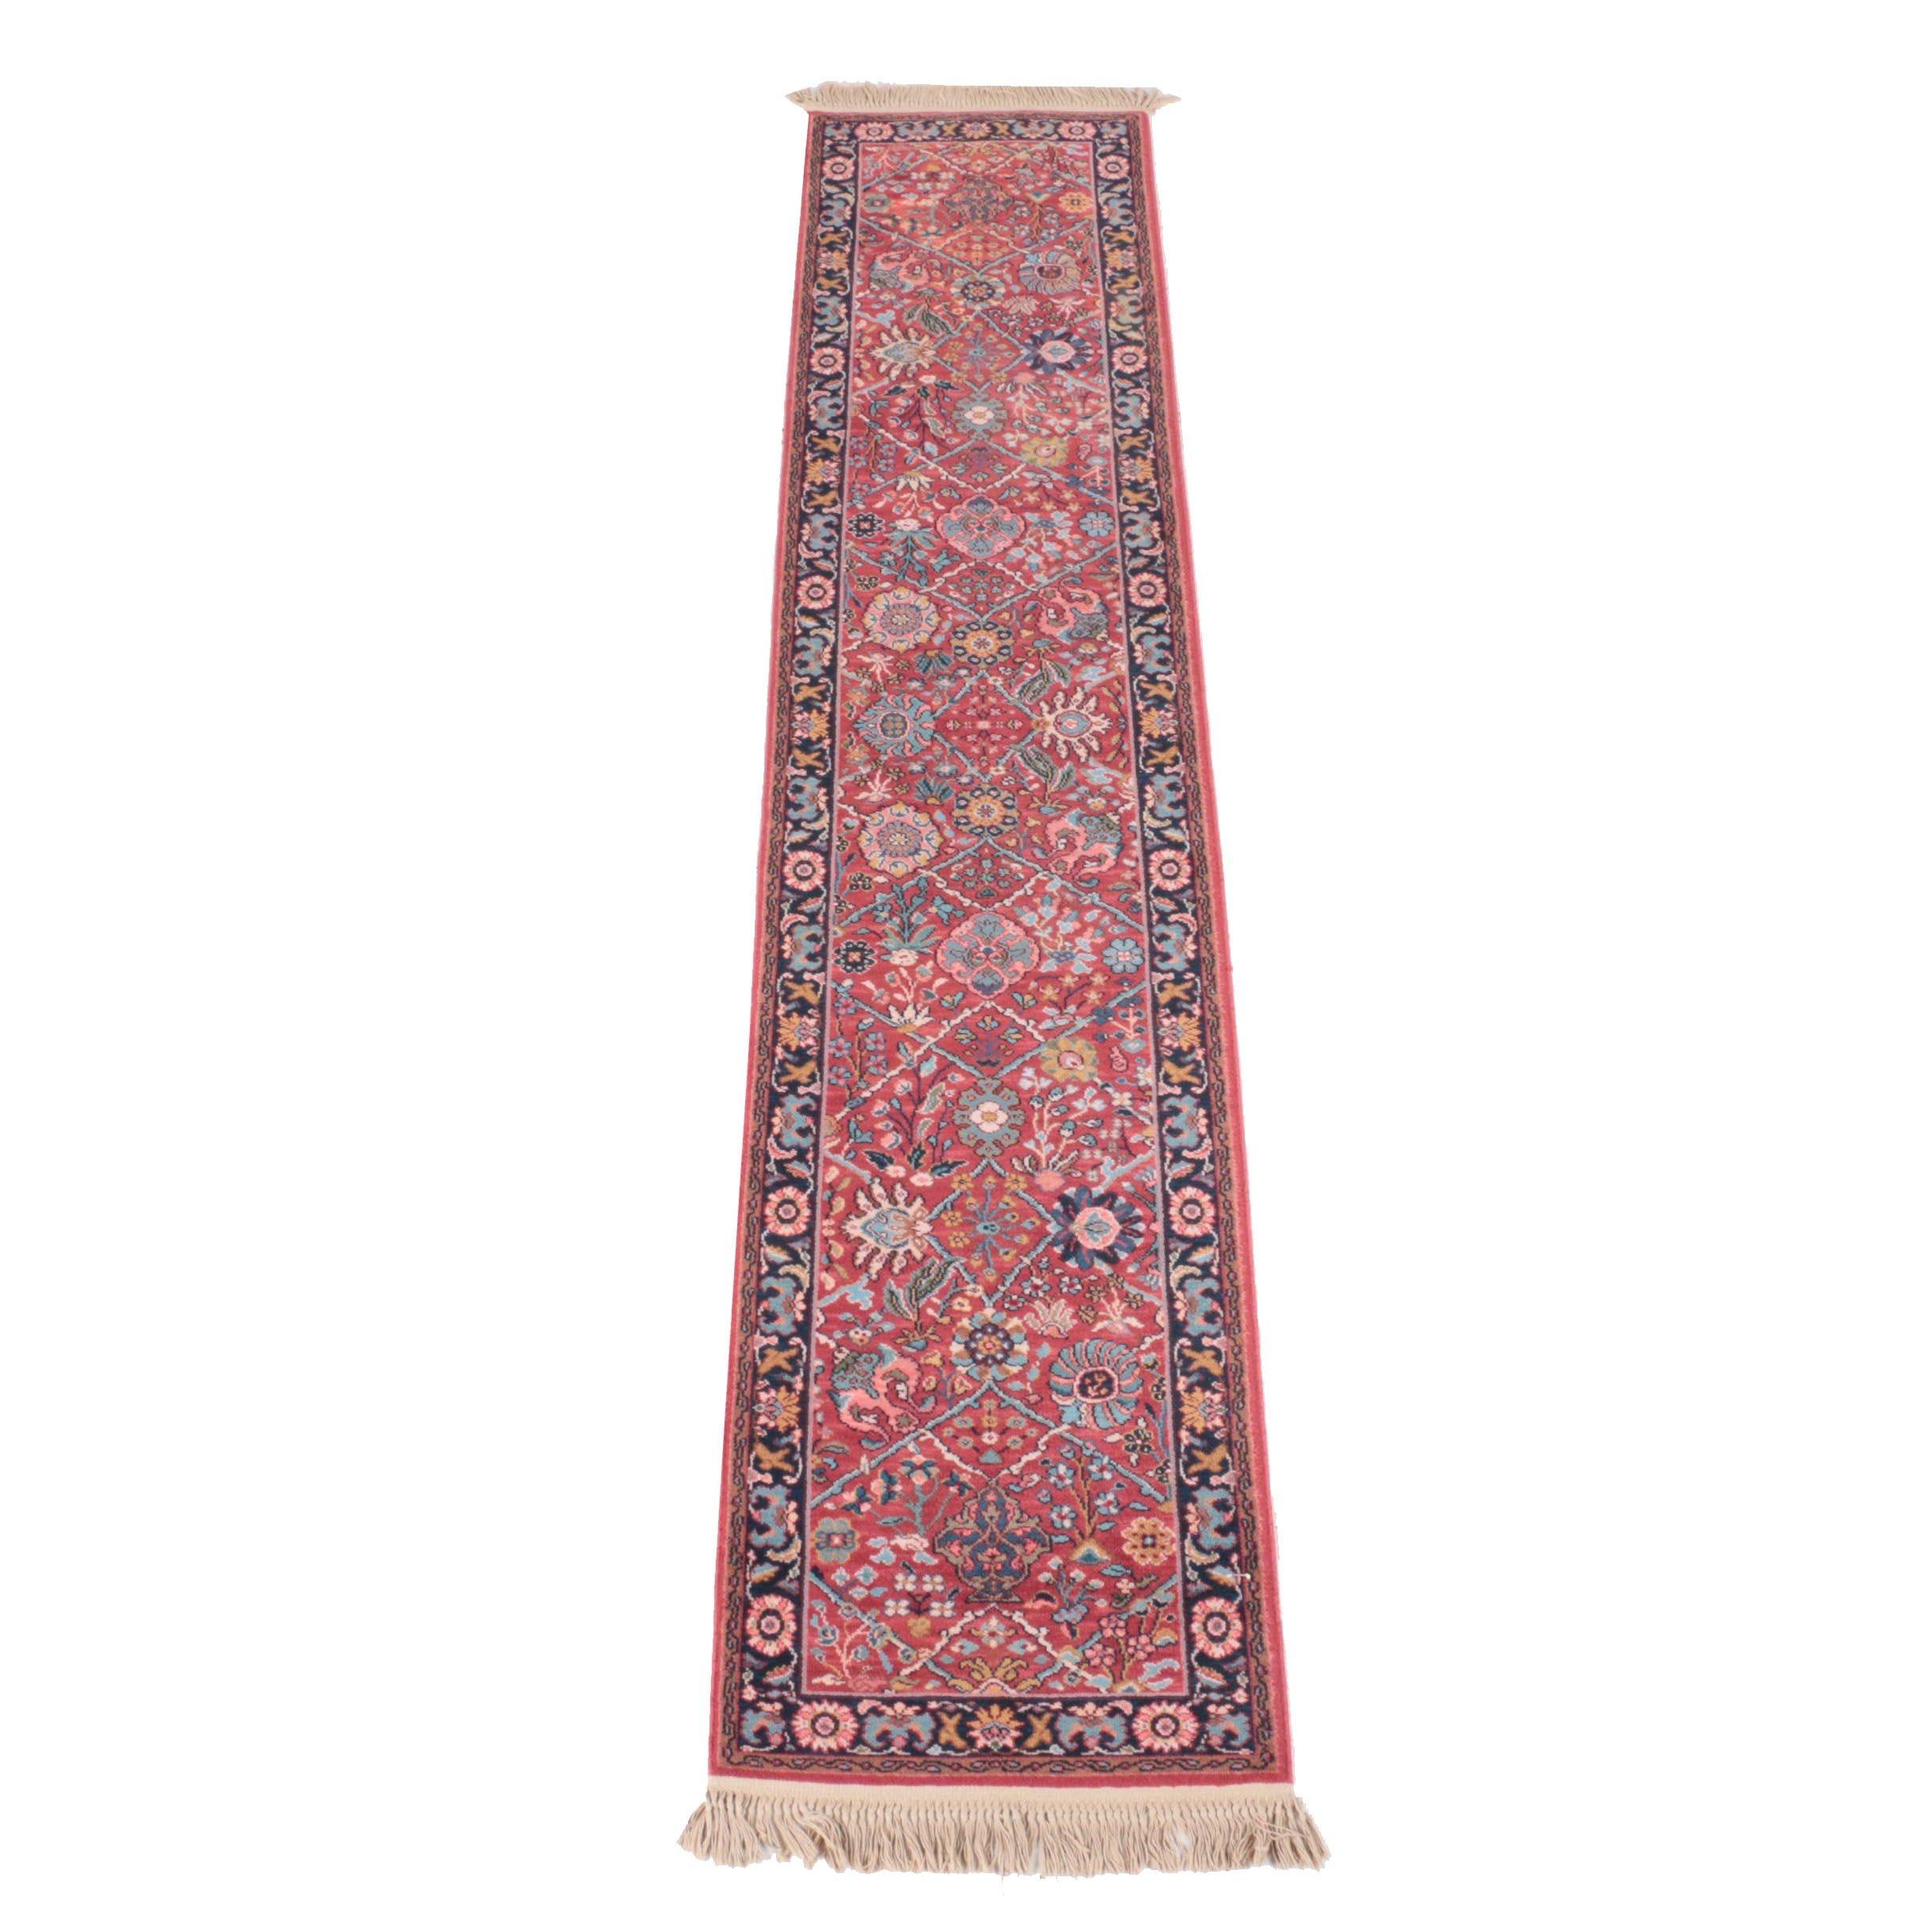 Machine Made Karastan Carpet Runner